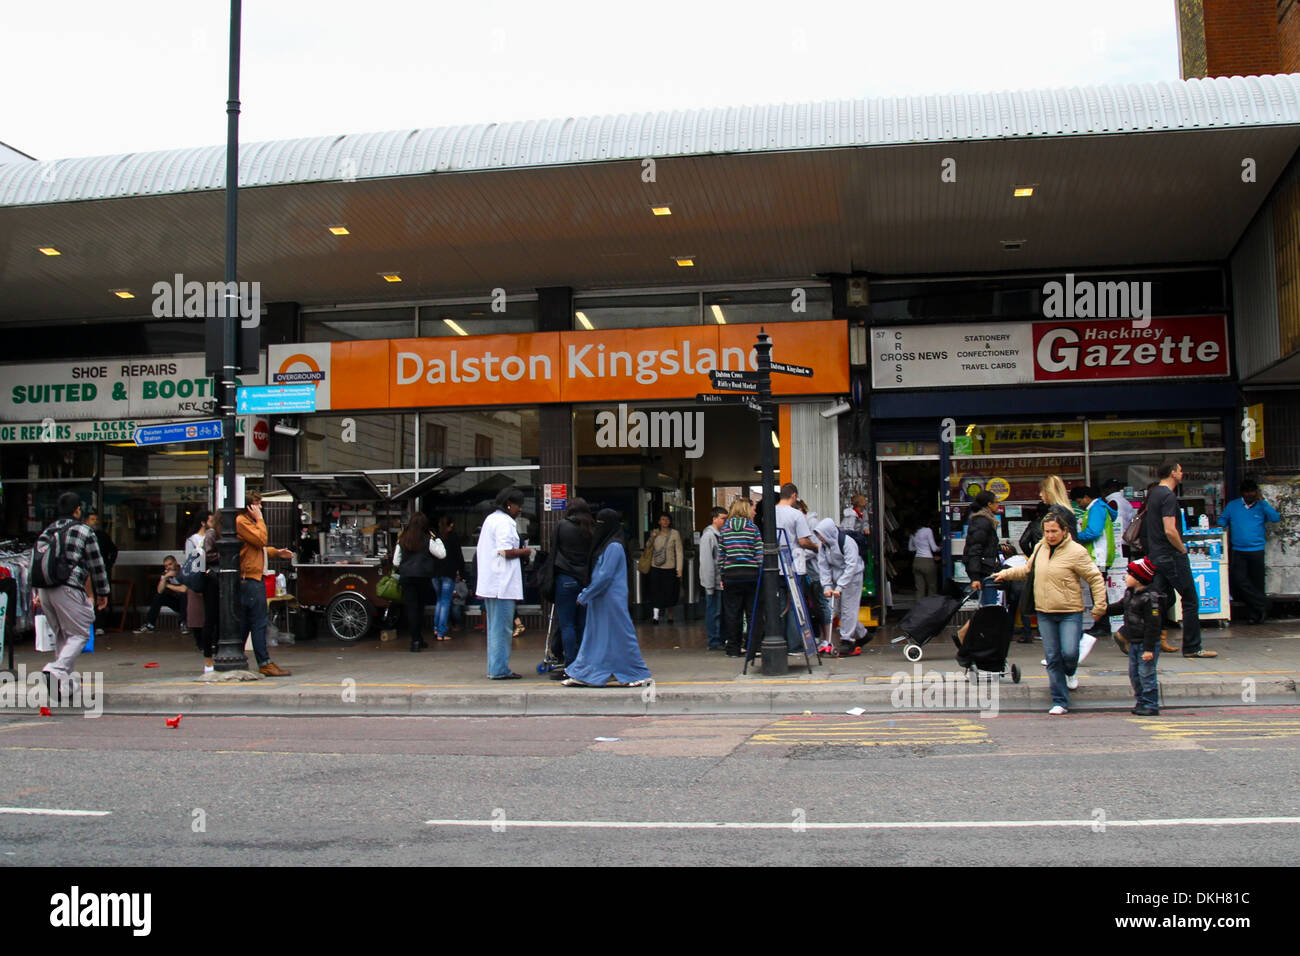 Dalston Kingsland Overground Station in East London - Stock Image